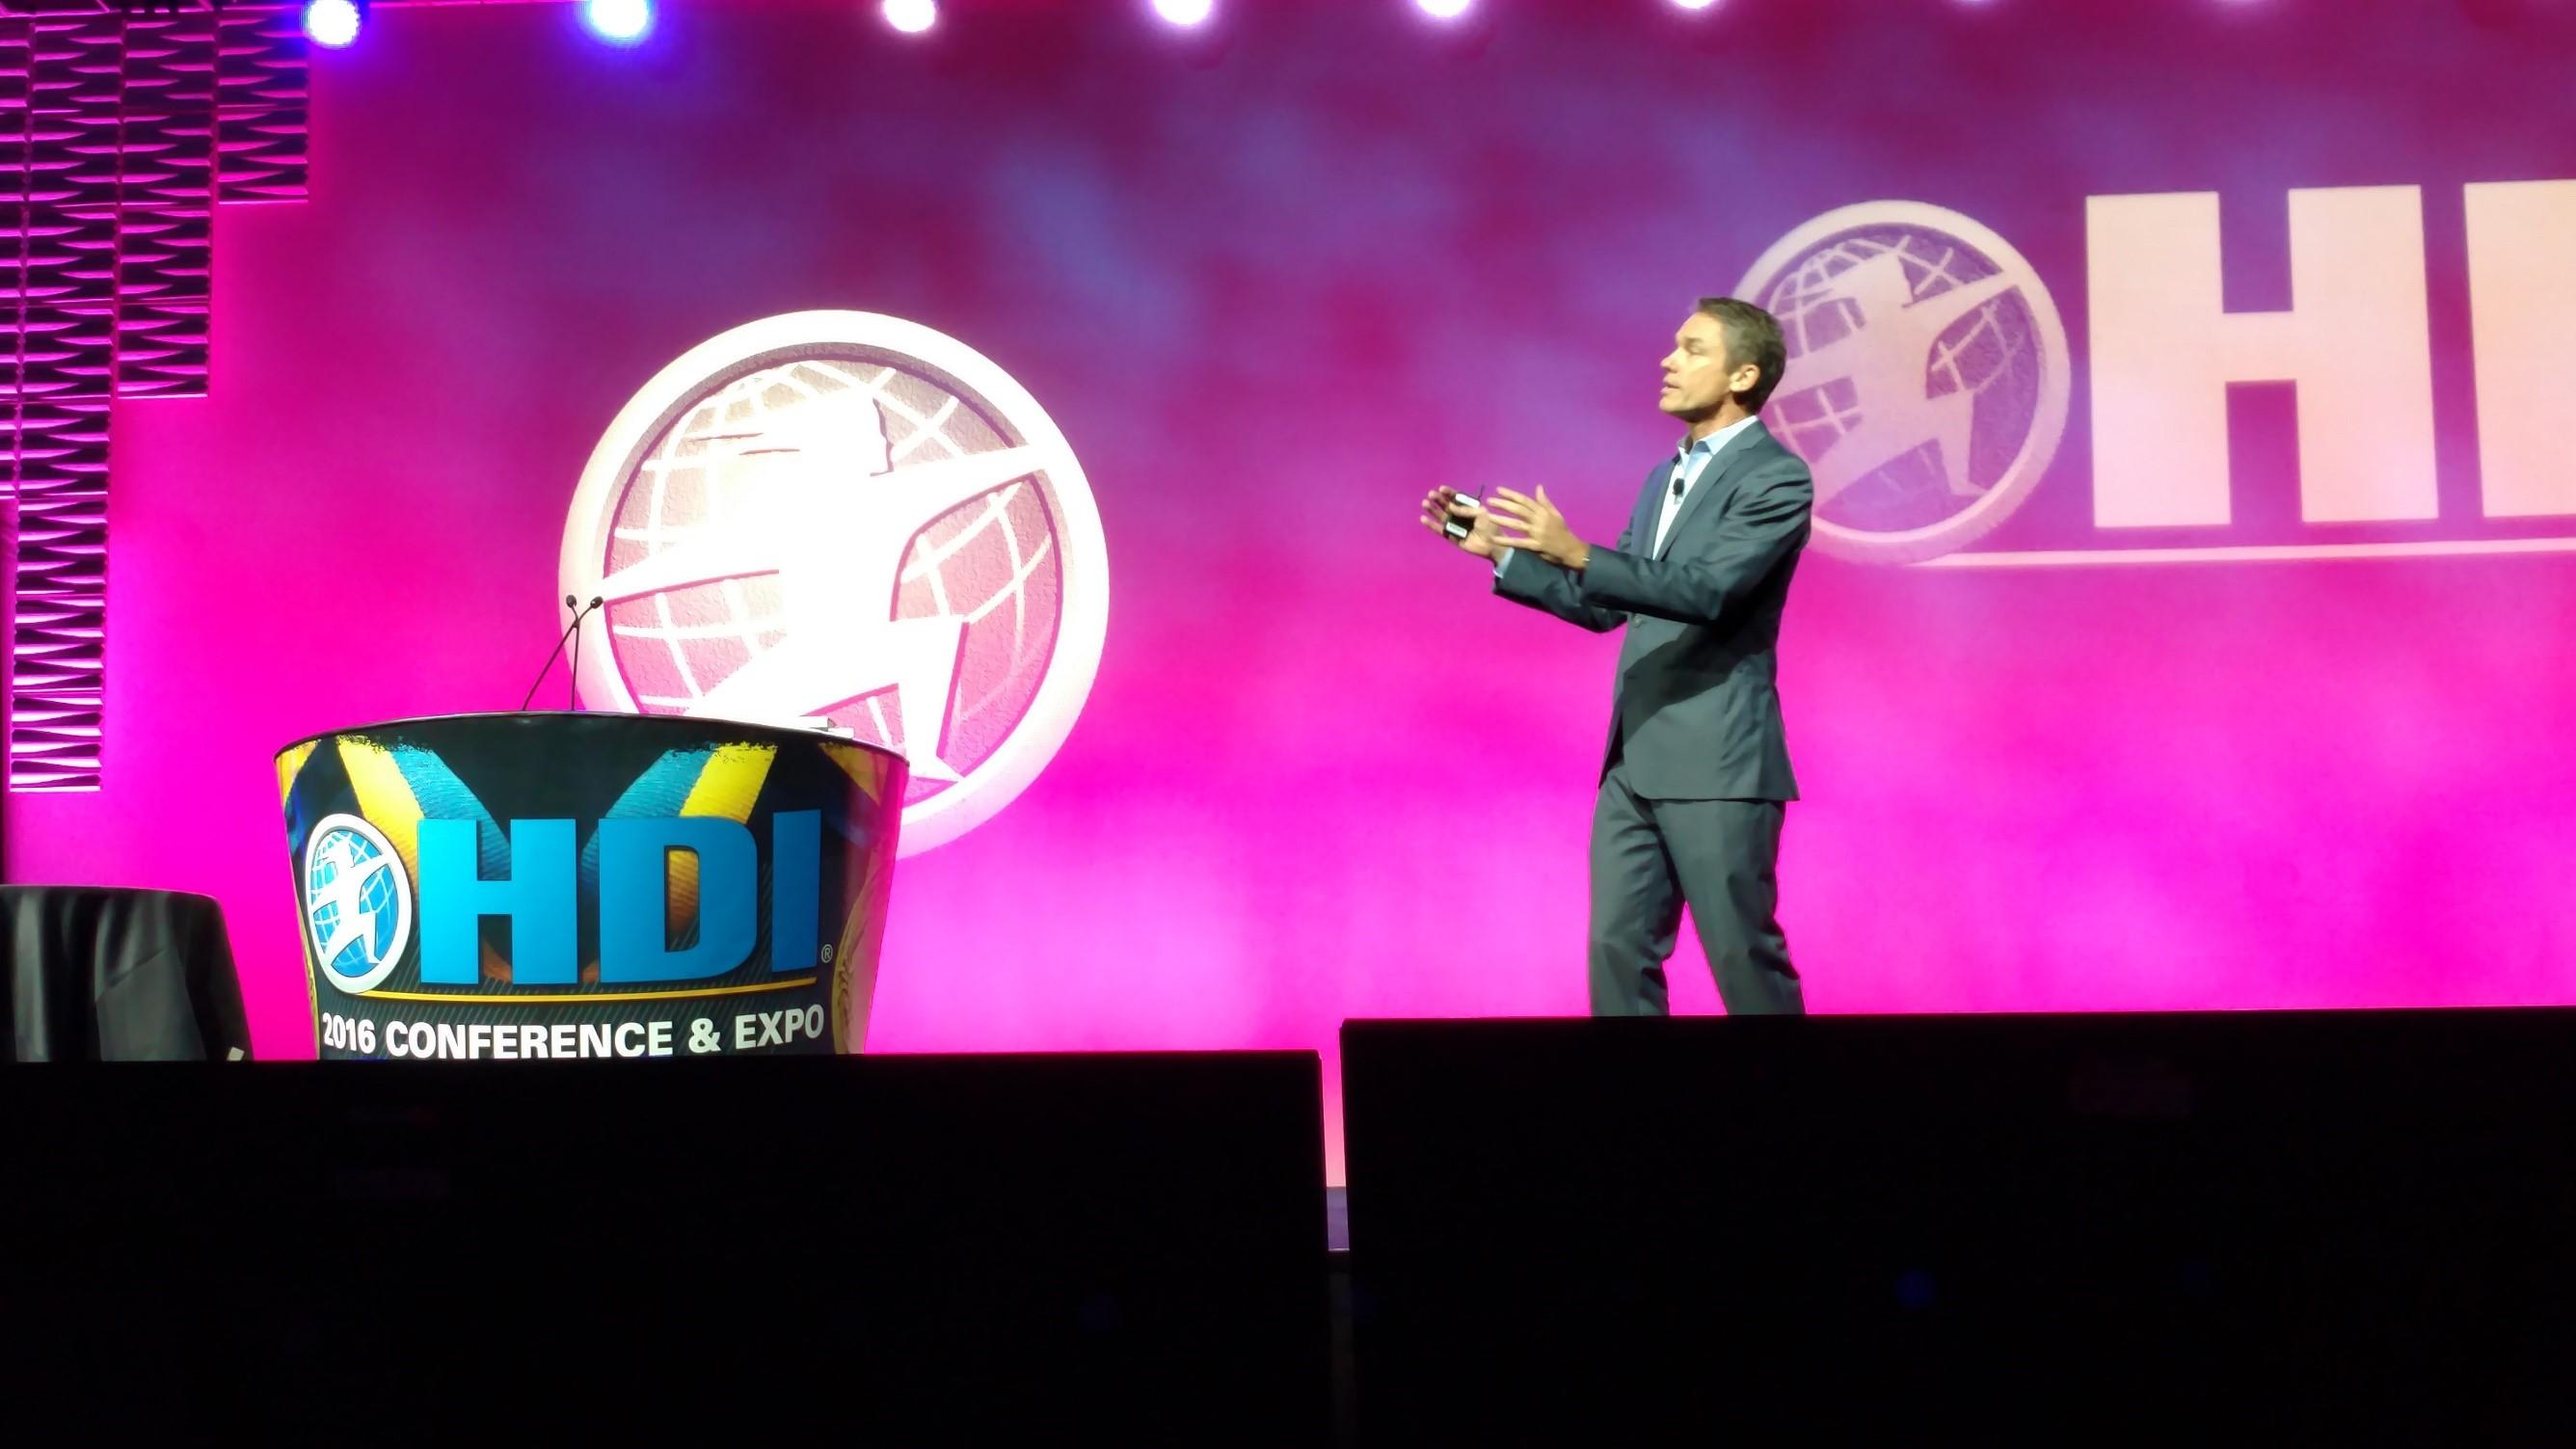 HDI Conf 2016 Blog 9